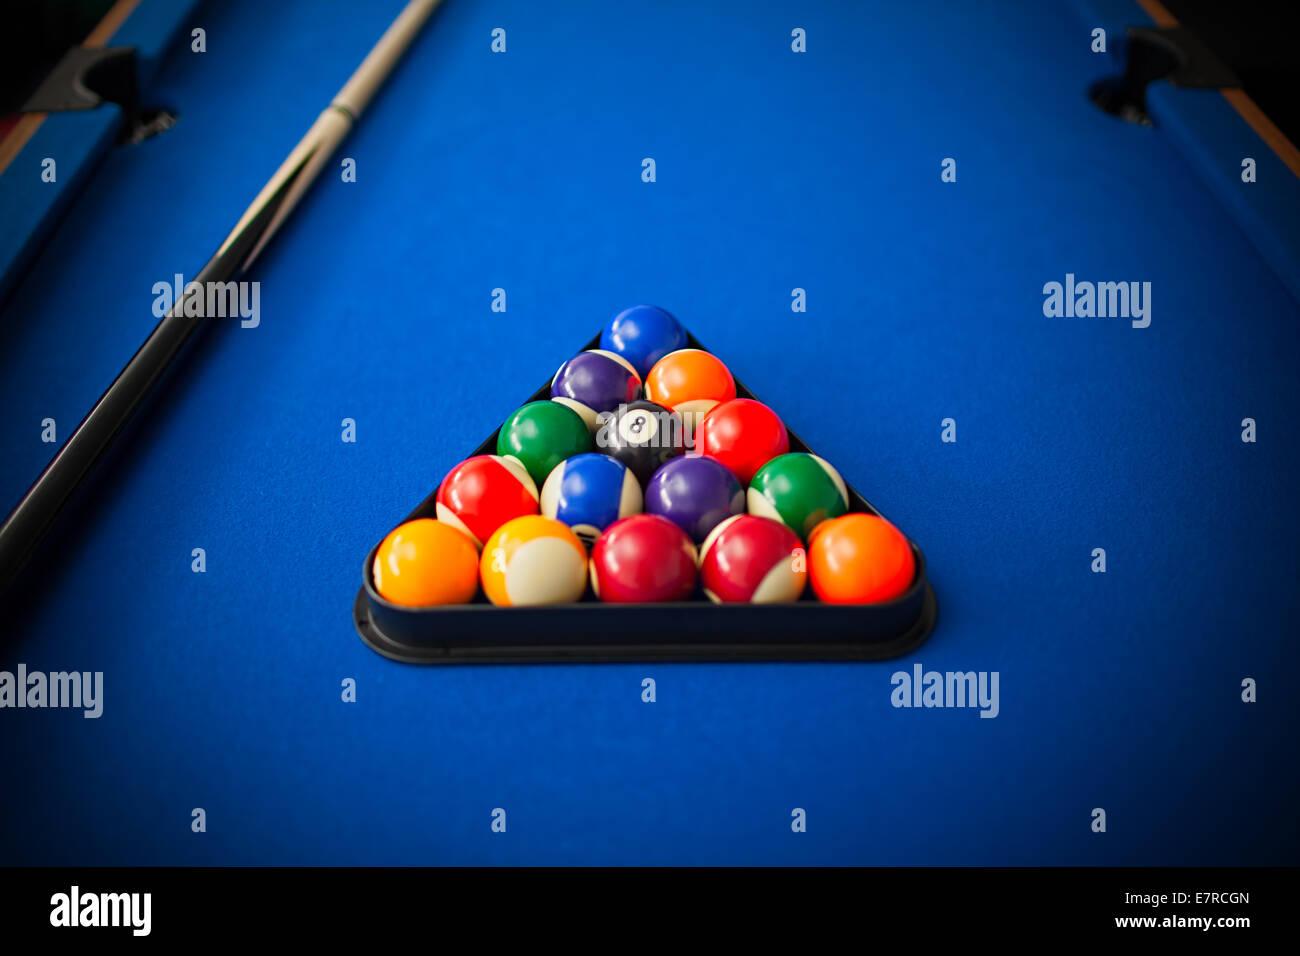 pool balls on table - Stock Image